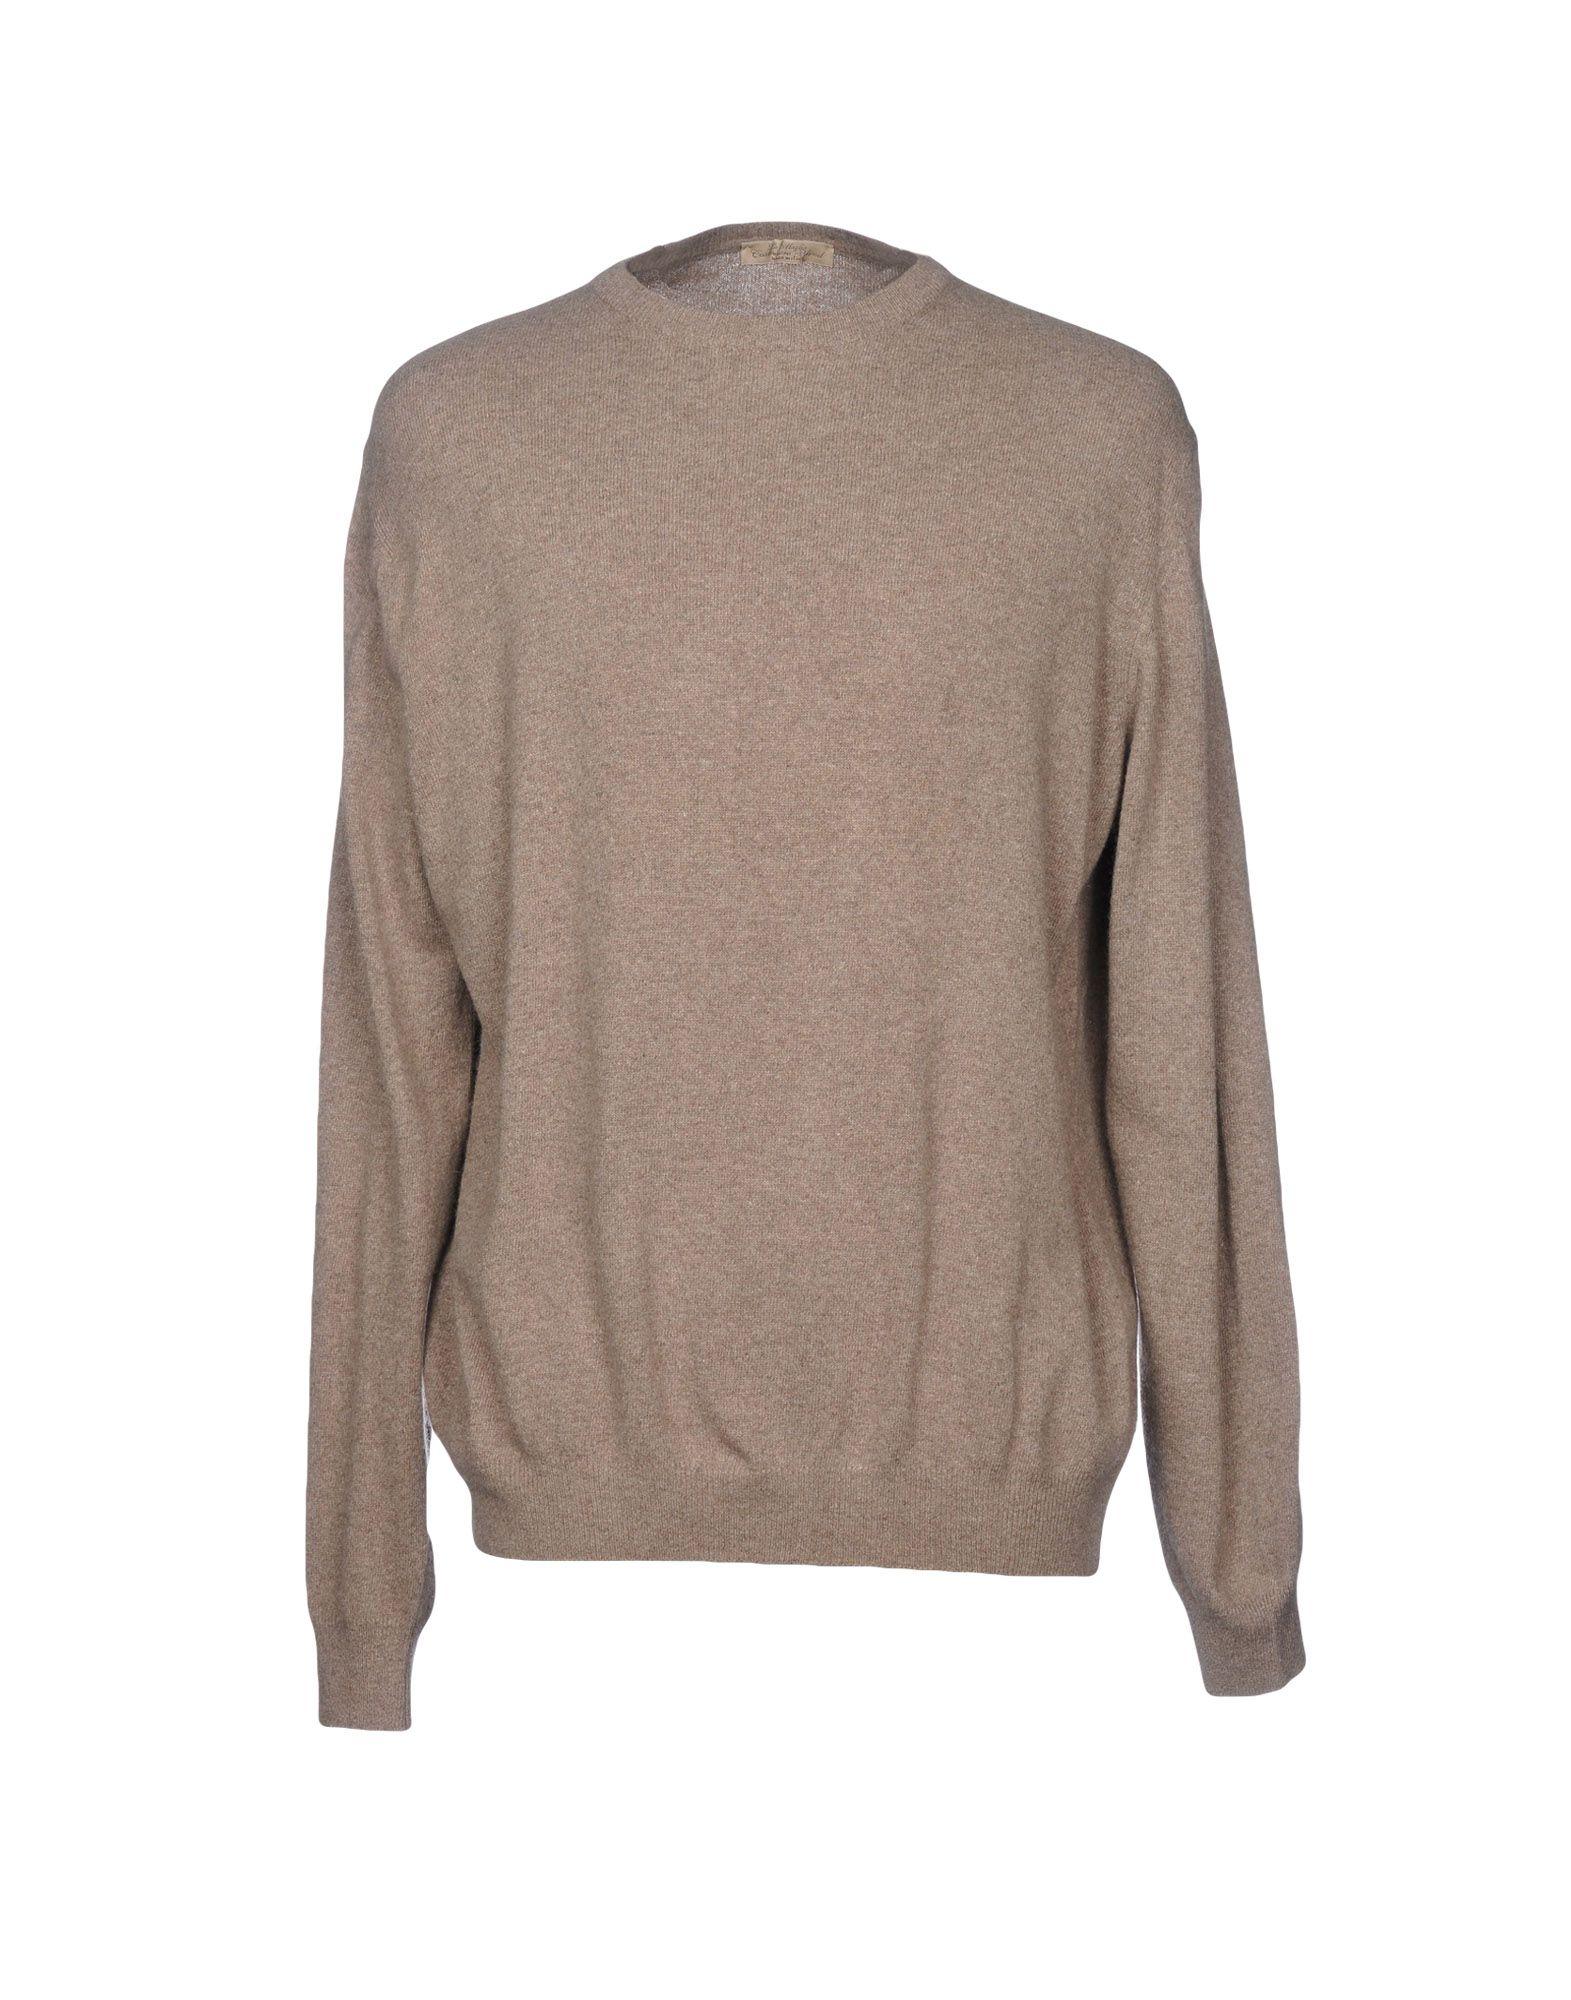 CASHMERE BLEND Свитер autumn cashmere свитер